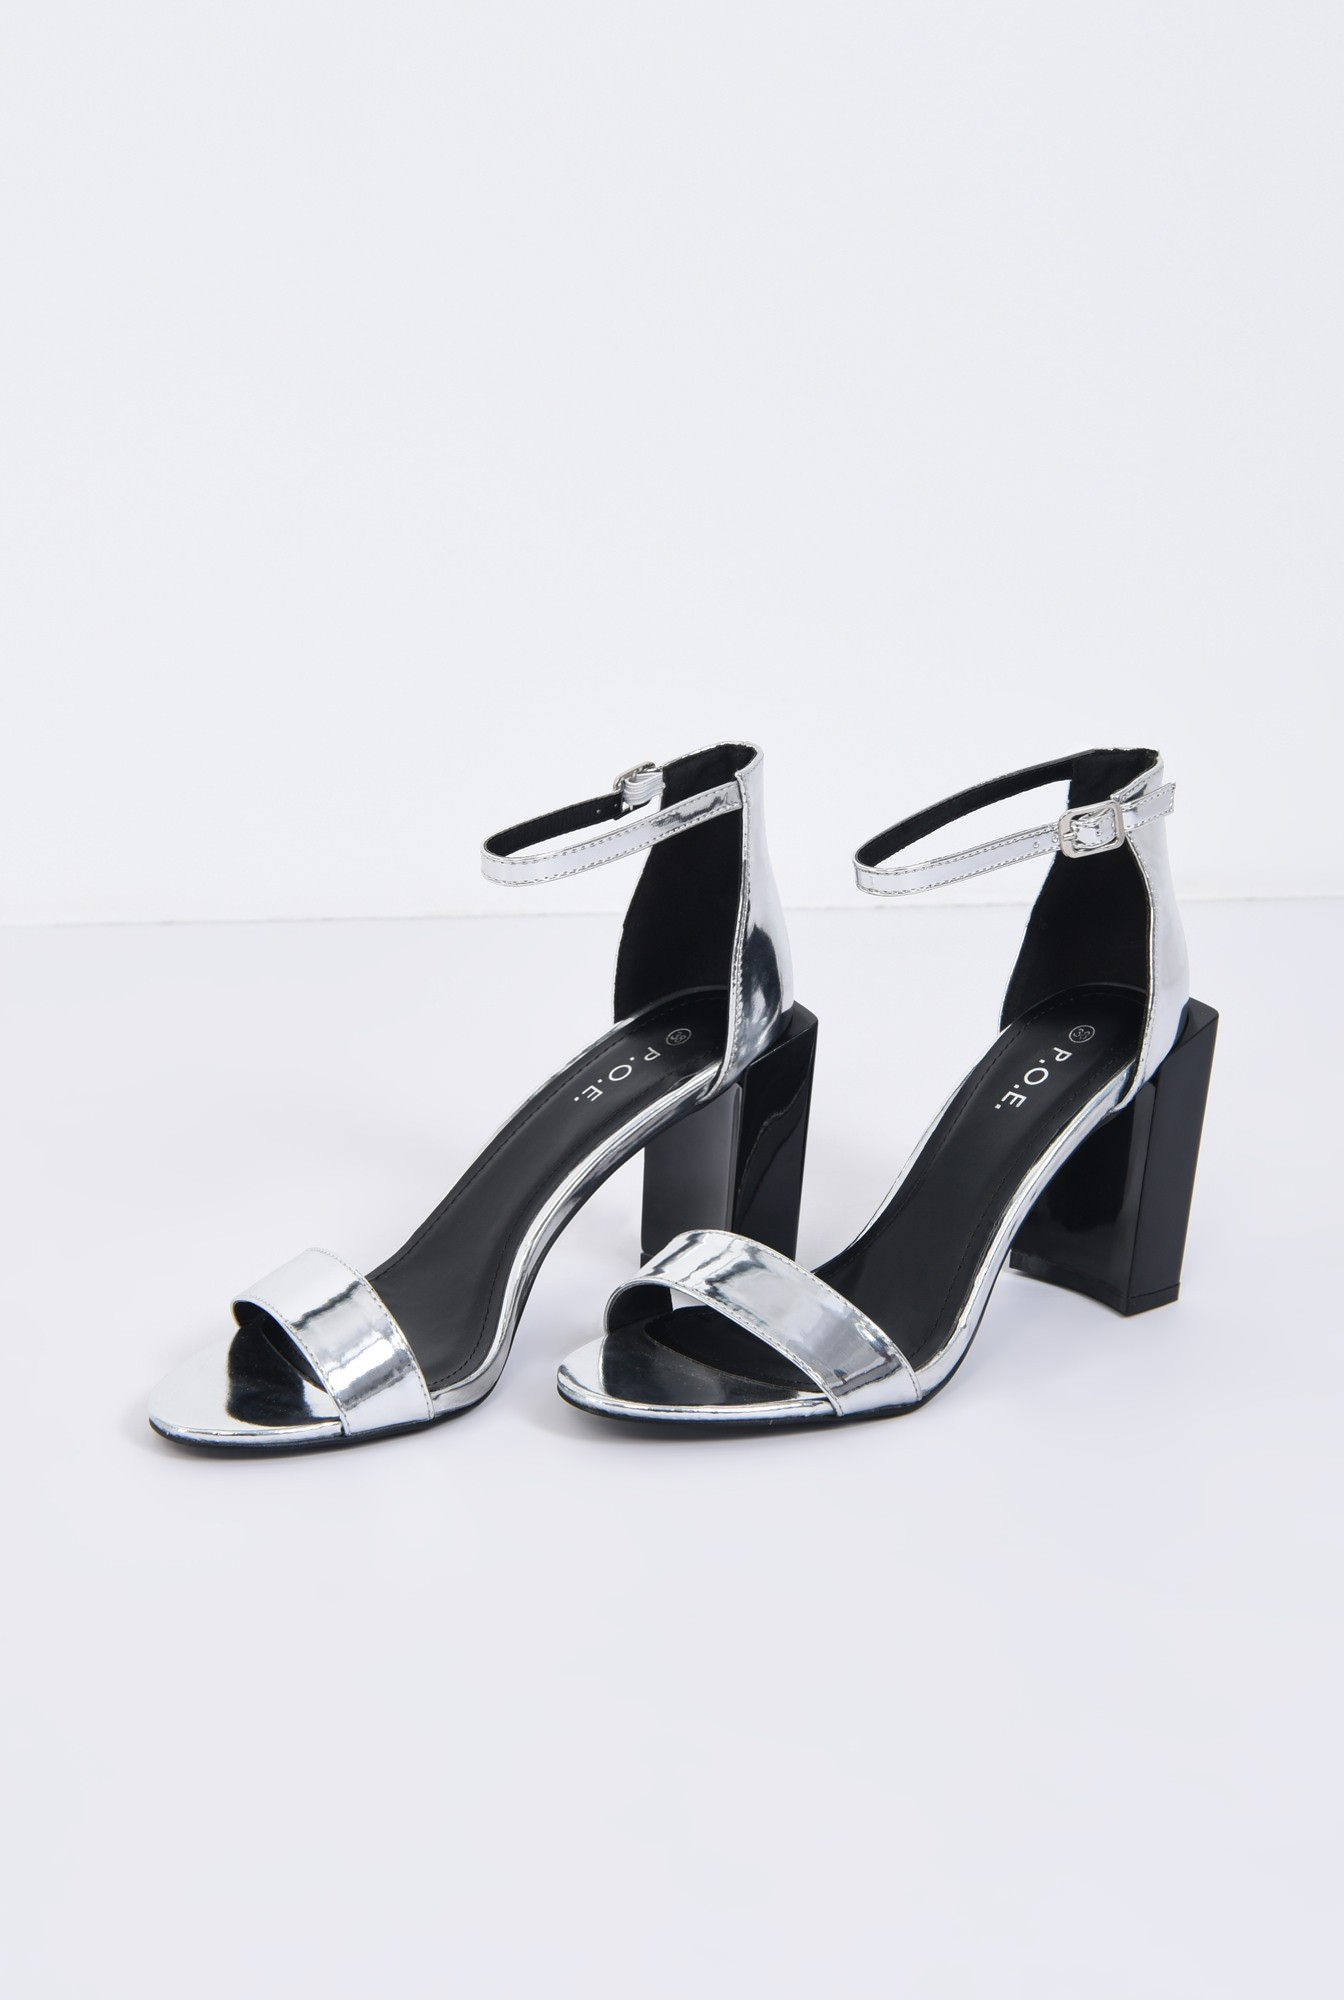 3 - sandale de zi, toc geometric, barete